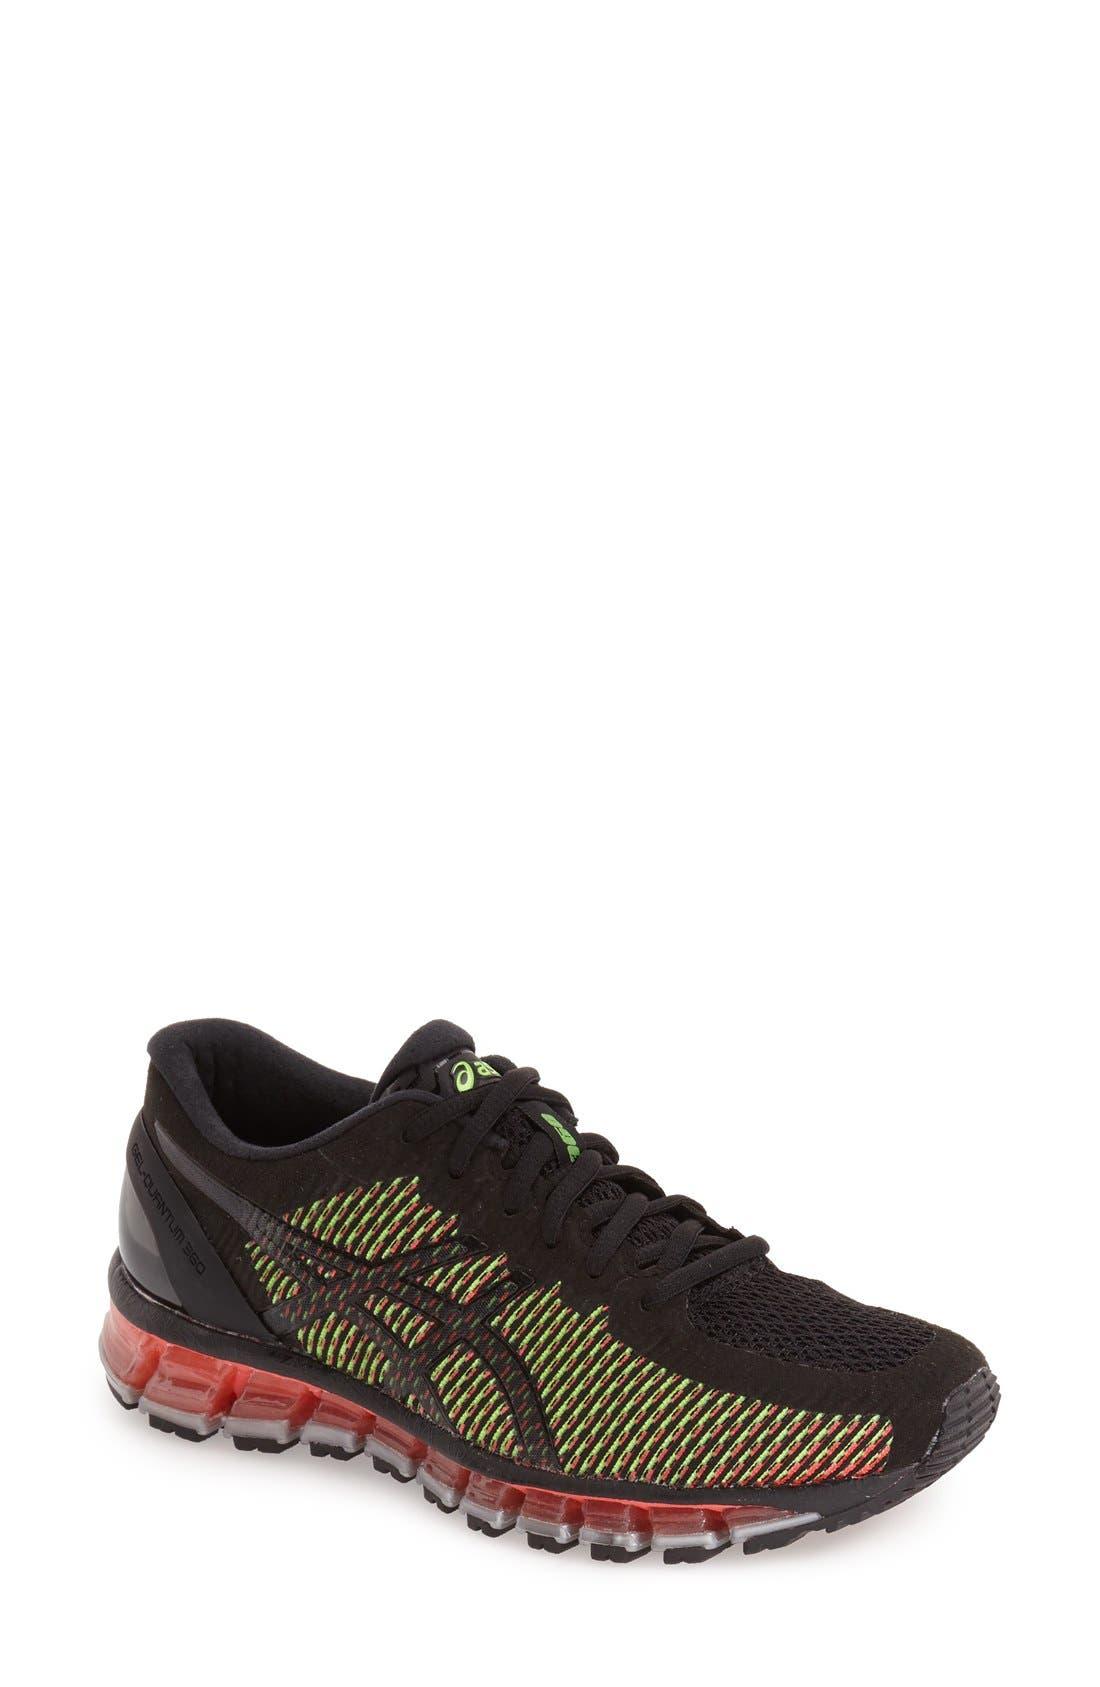 Alternate Image 1 Selected - ASICS® 'GEL-Quantum 360' Running Shoe (Women)